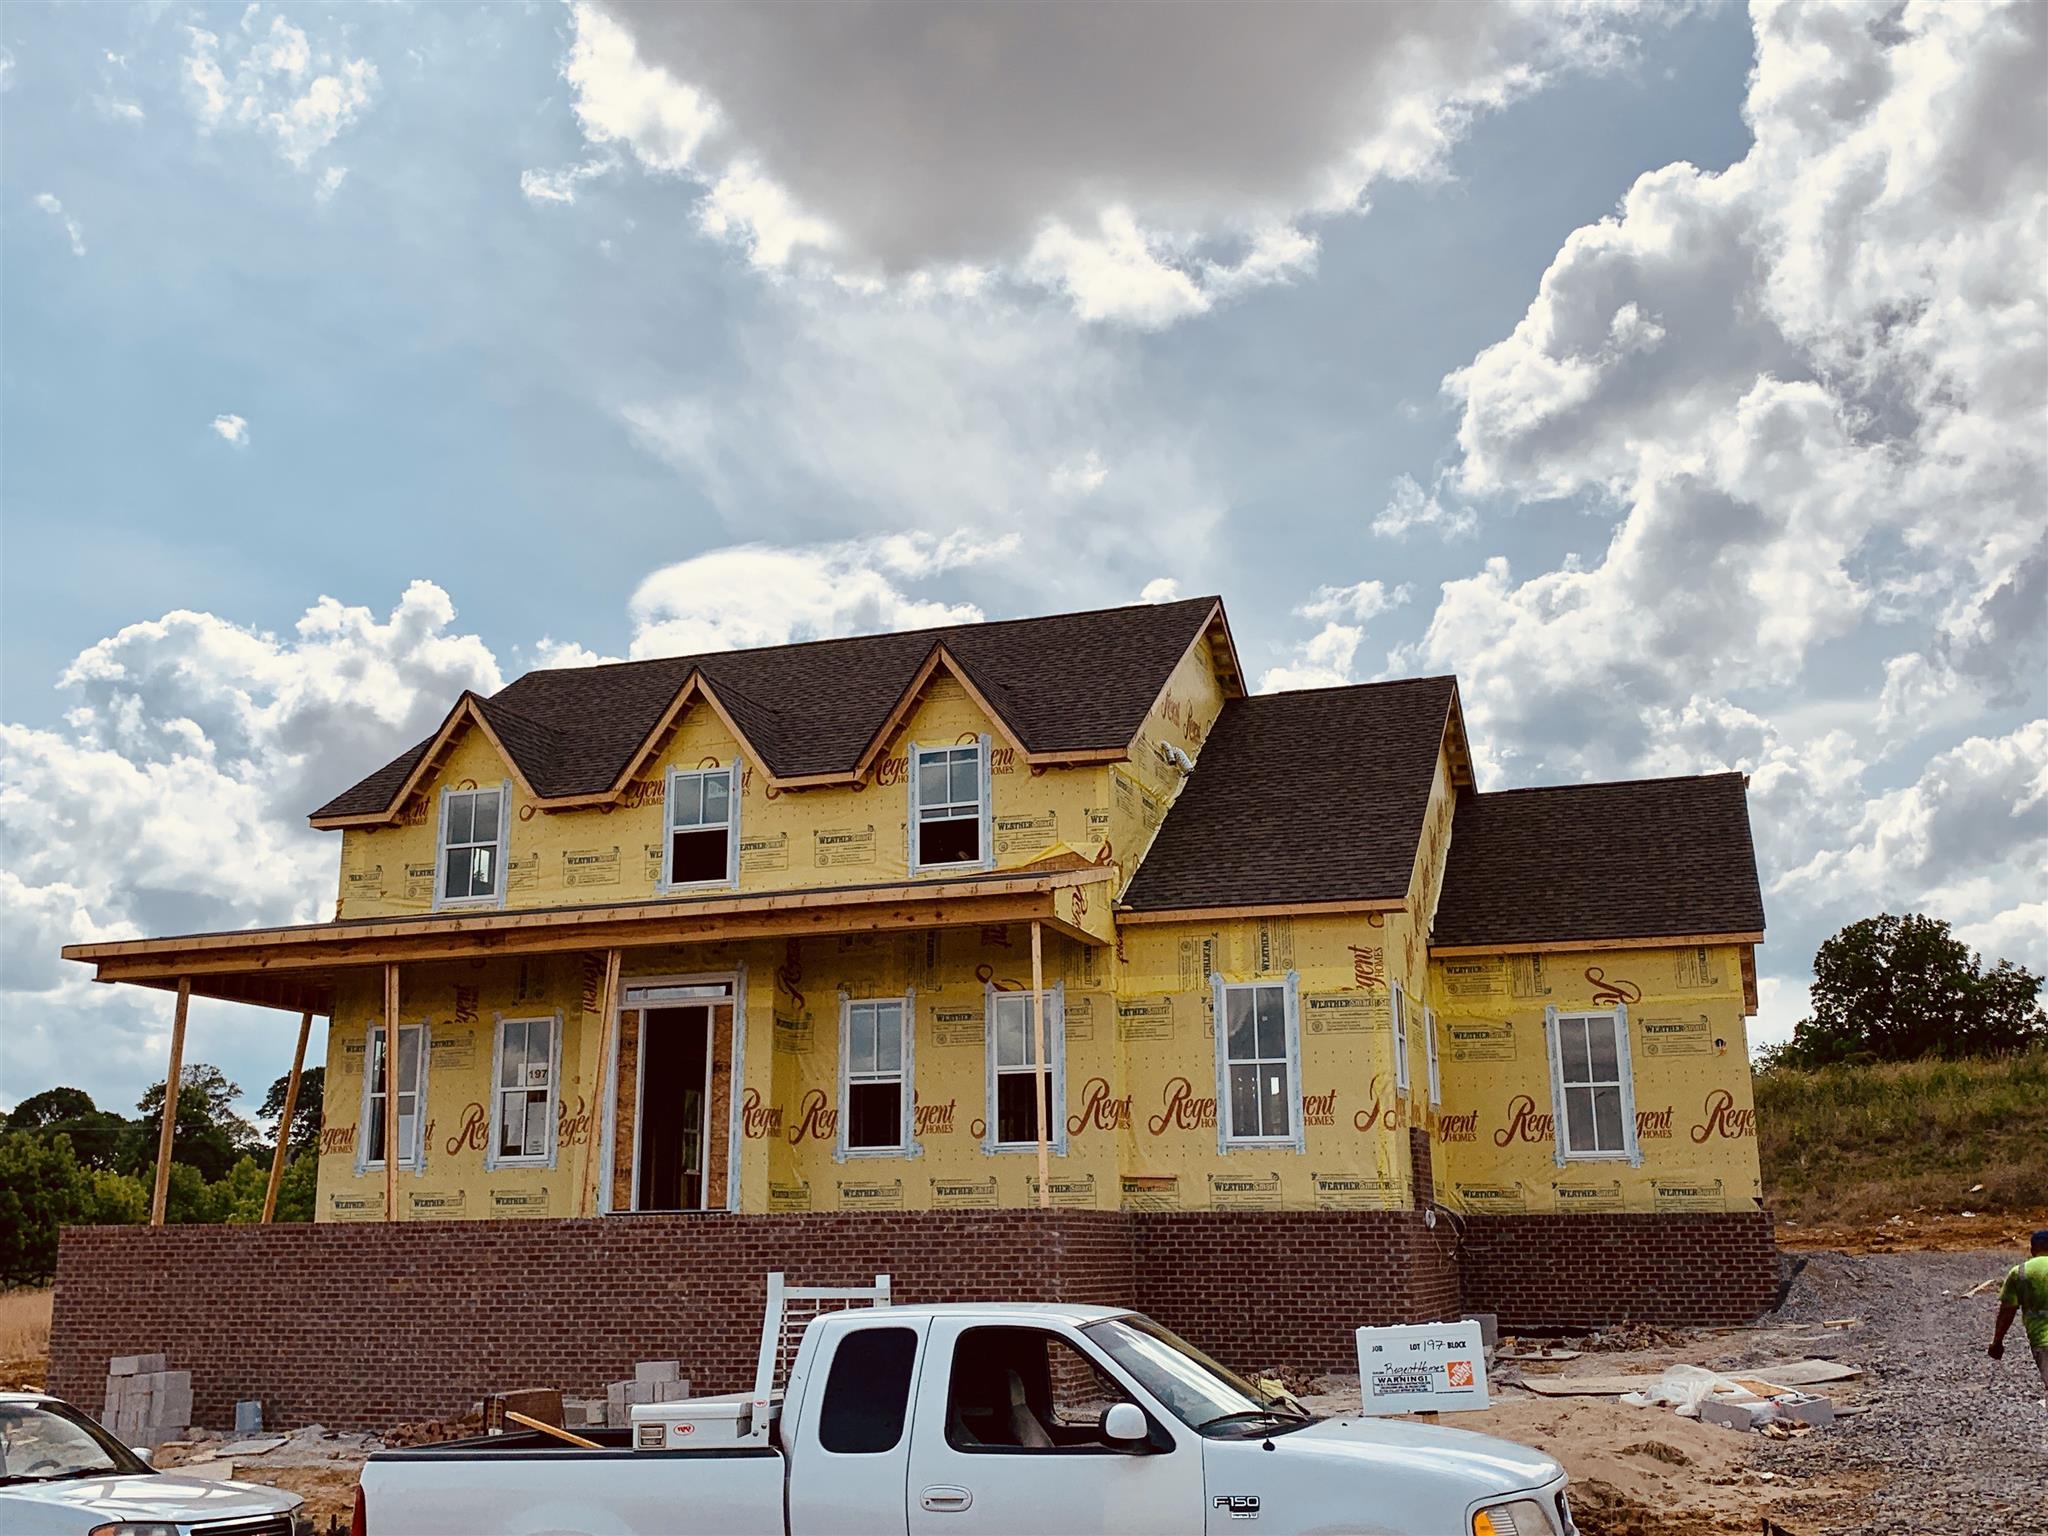 2392 Fairchild Circle #197, Nolensville, TN 37135 - Nolensville, TN real estate listing